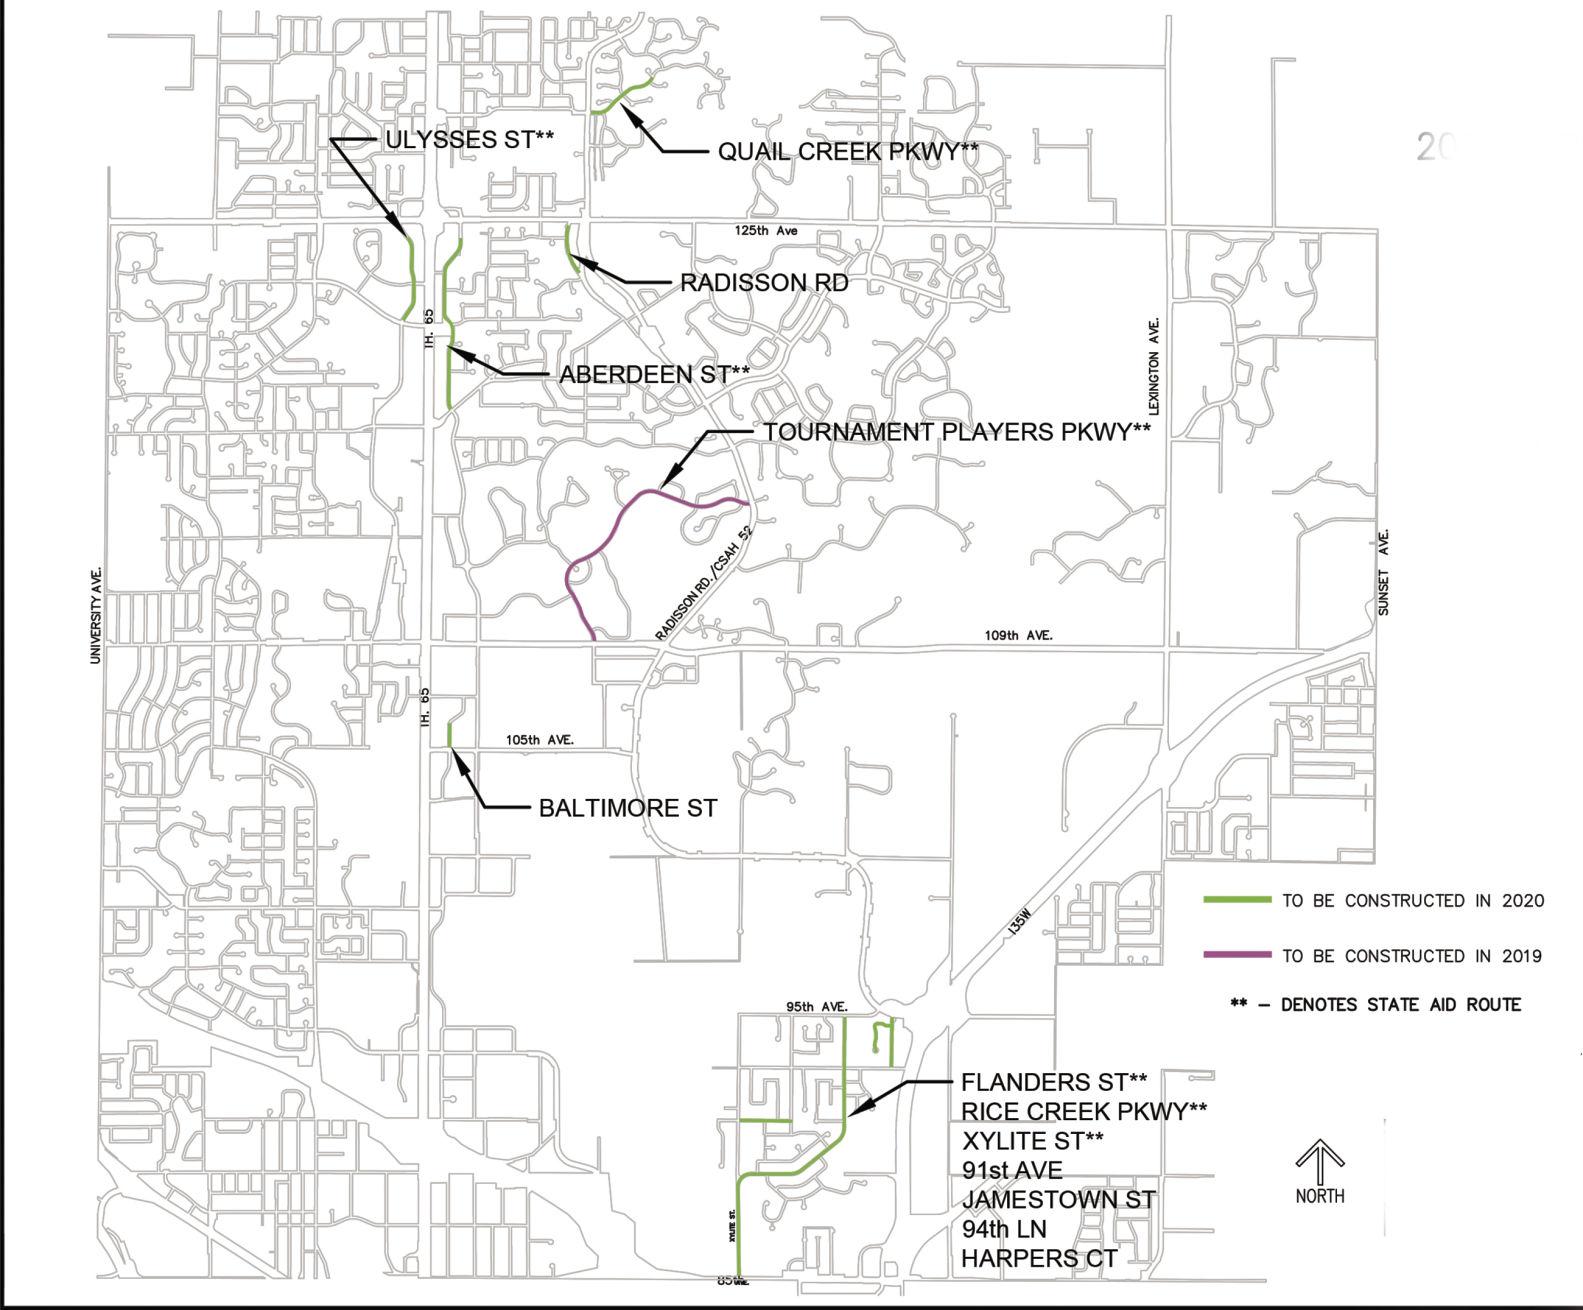 blaine approves 2019 2020 street reconstruction projects blaine hometownsource com [ 1200 x 993 Pixel ]